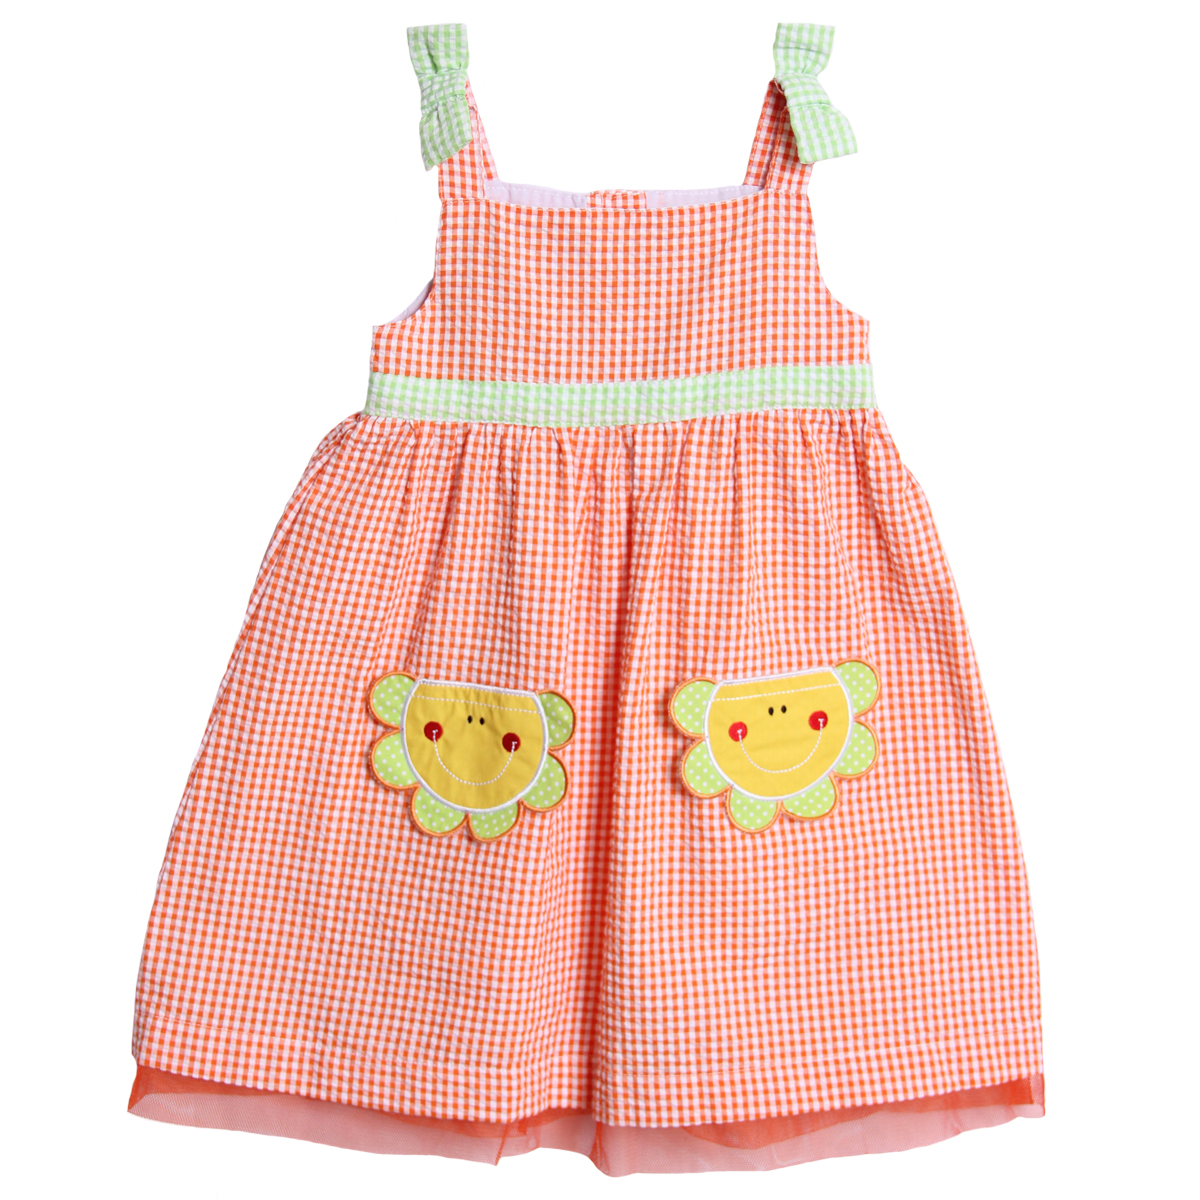 Baby Togs Little Girls 1 Piece Orange Green Seersucker Sundress Sunshine Dress at Sears.com